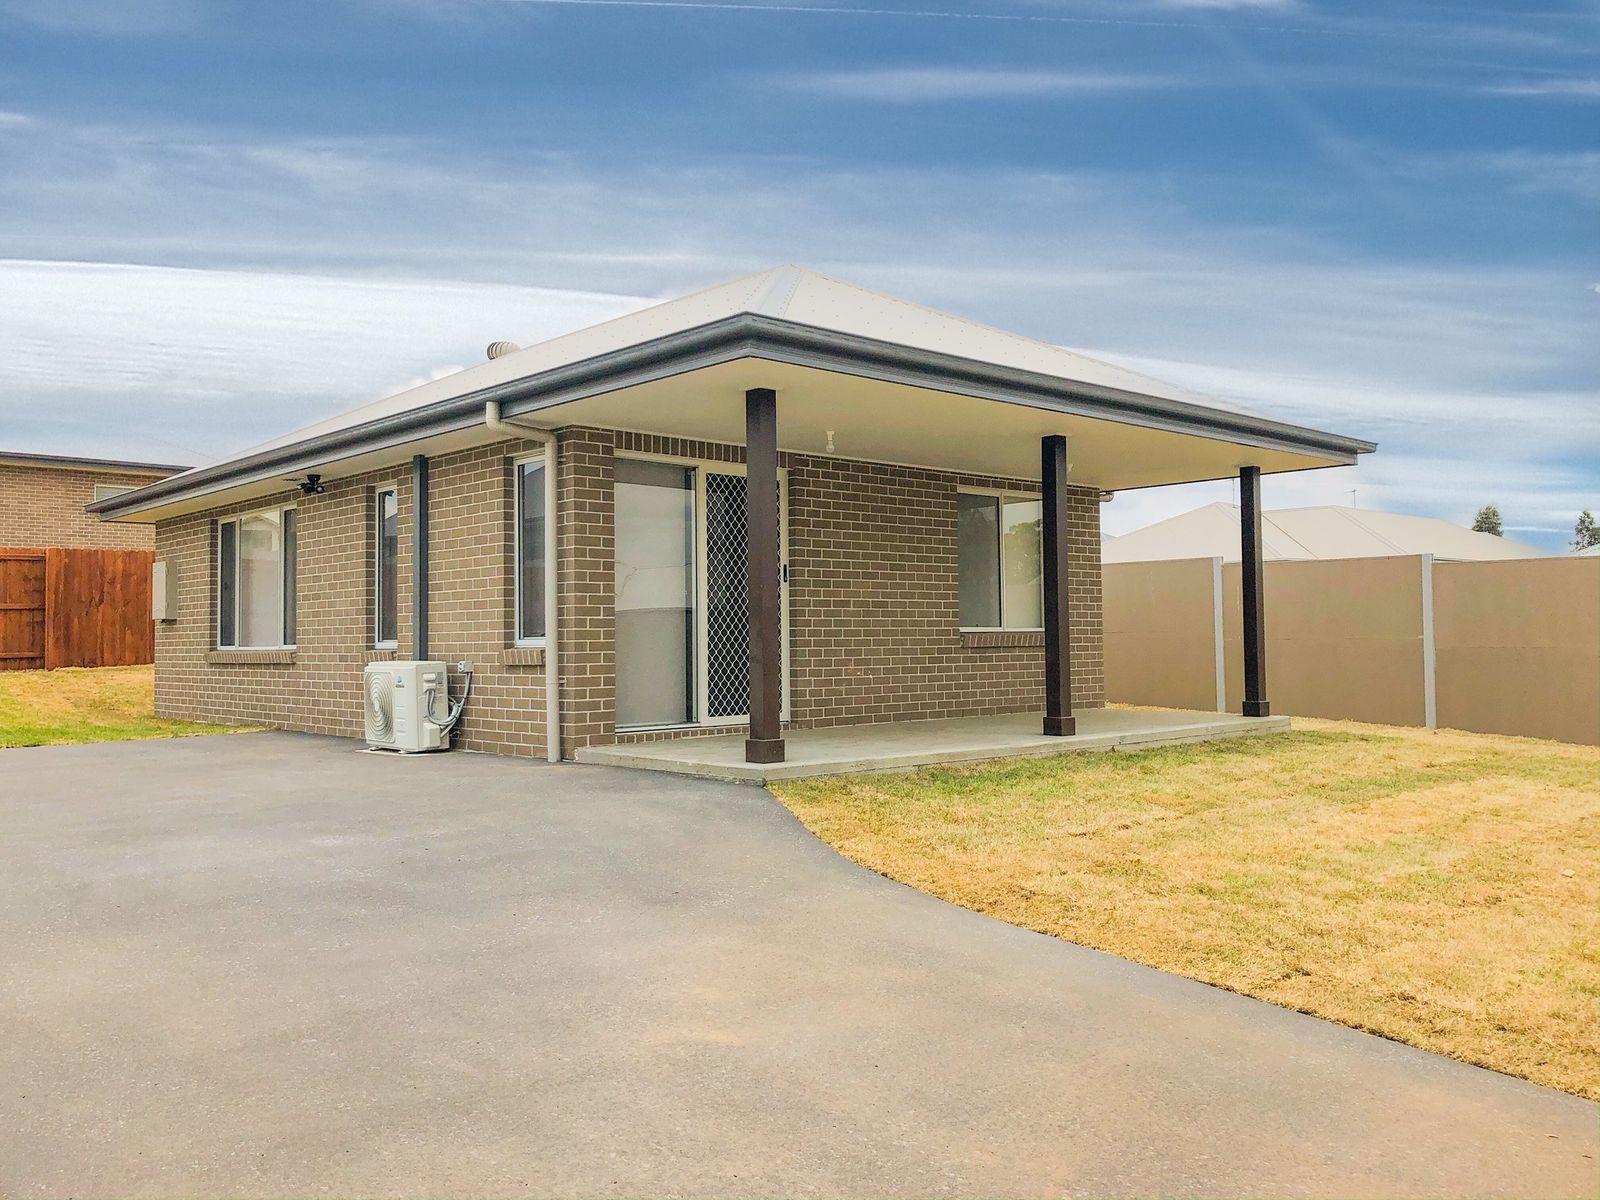 5A Enright Drive, North Rothbury, NSW 2335